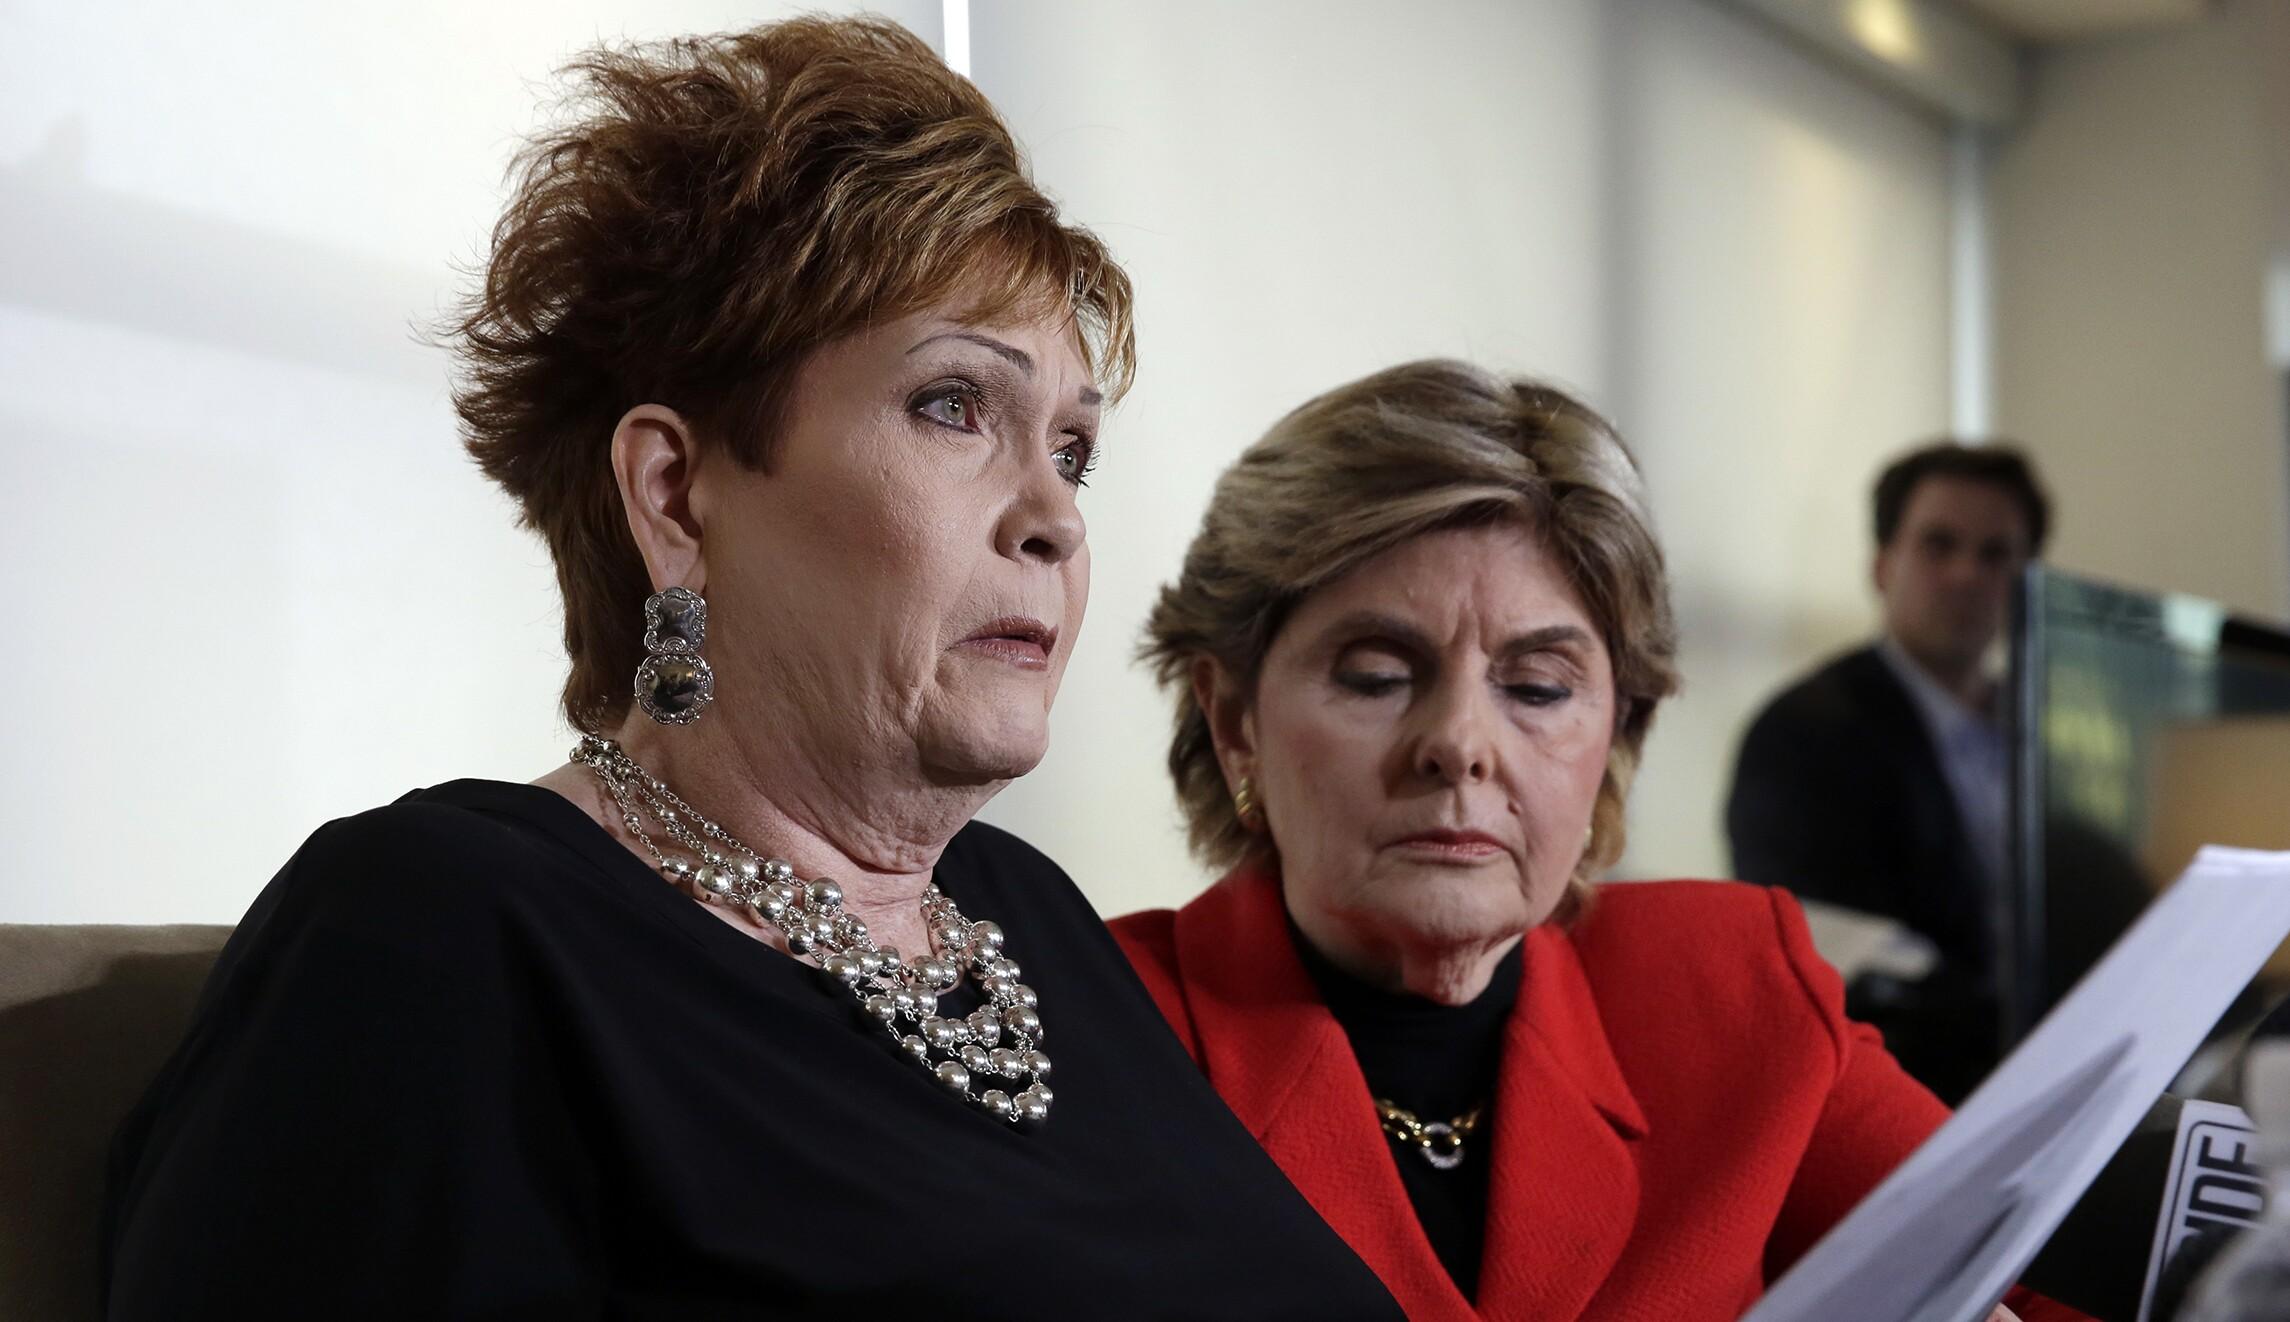 Gloria Allred wants Senate hearing to investigate Roy Moore